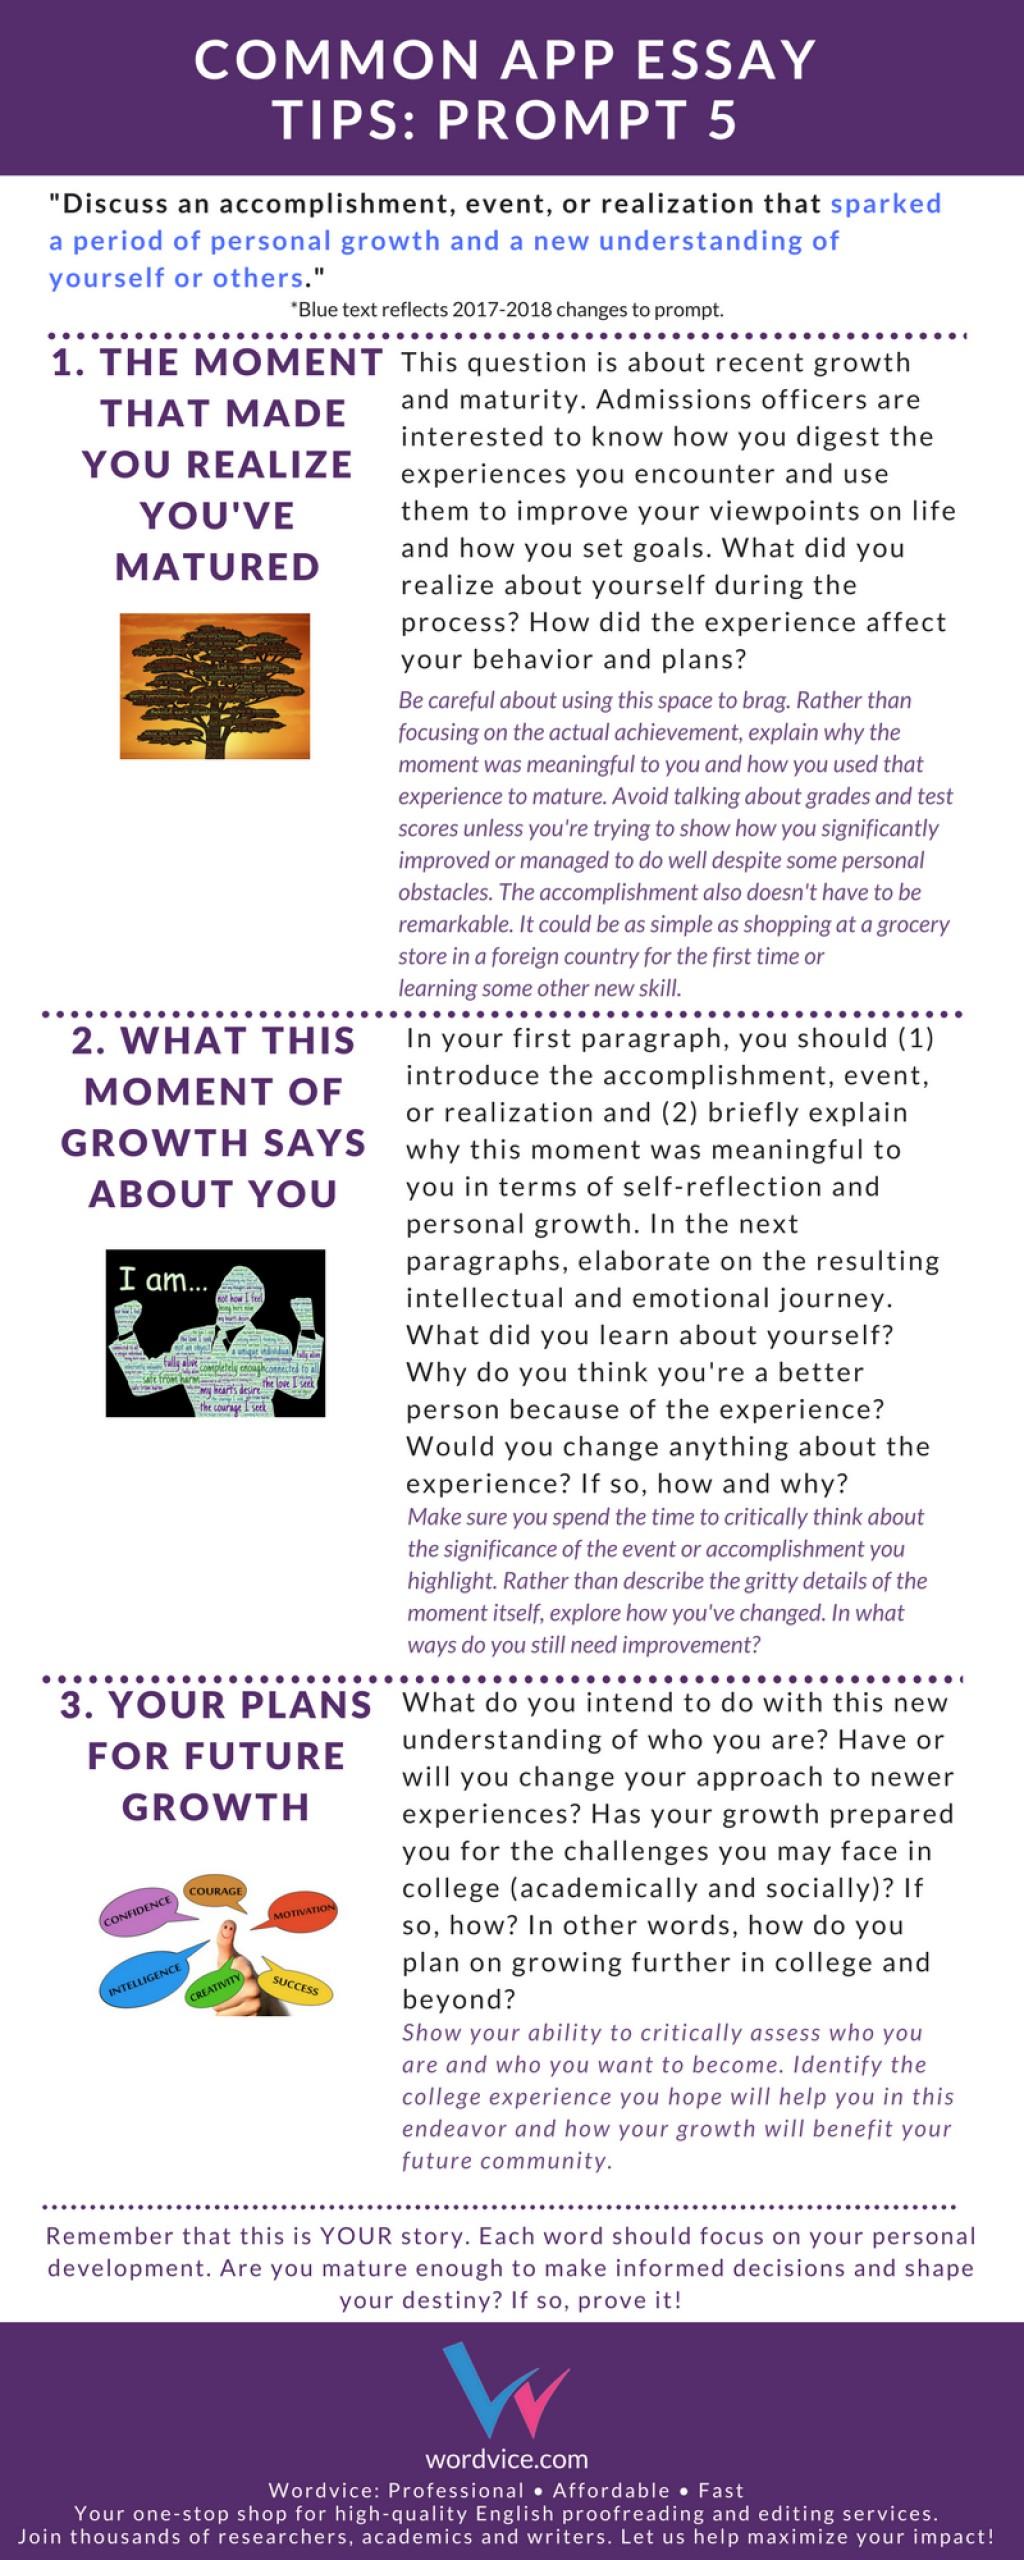 017 Common App Brainstormprompt Essay Prompt Unusual Examples 6 1 Sample Large